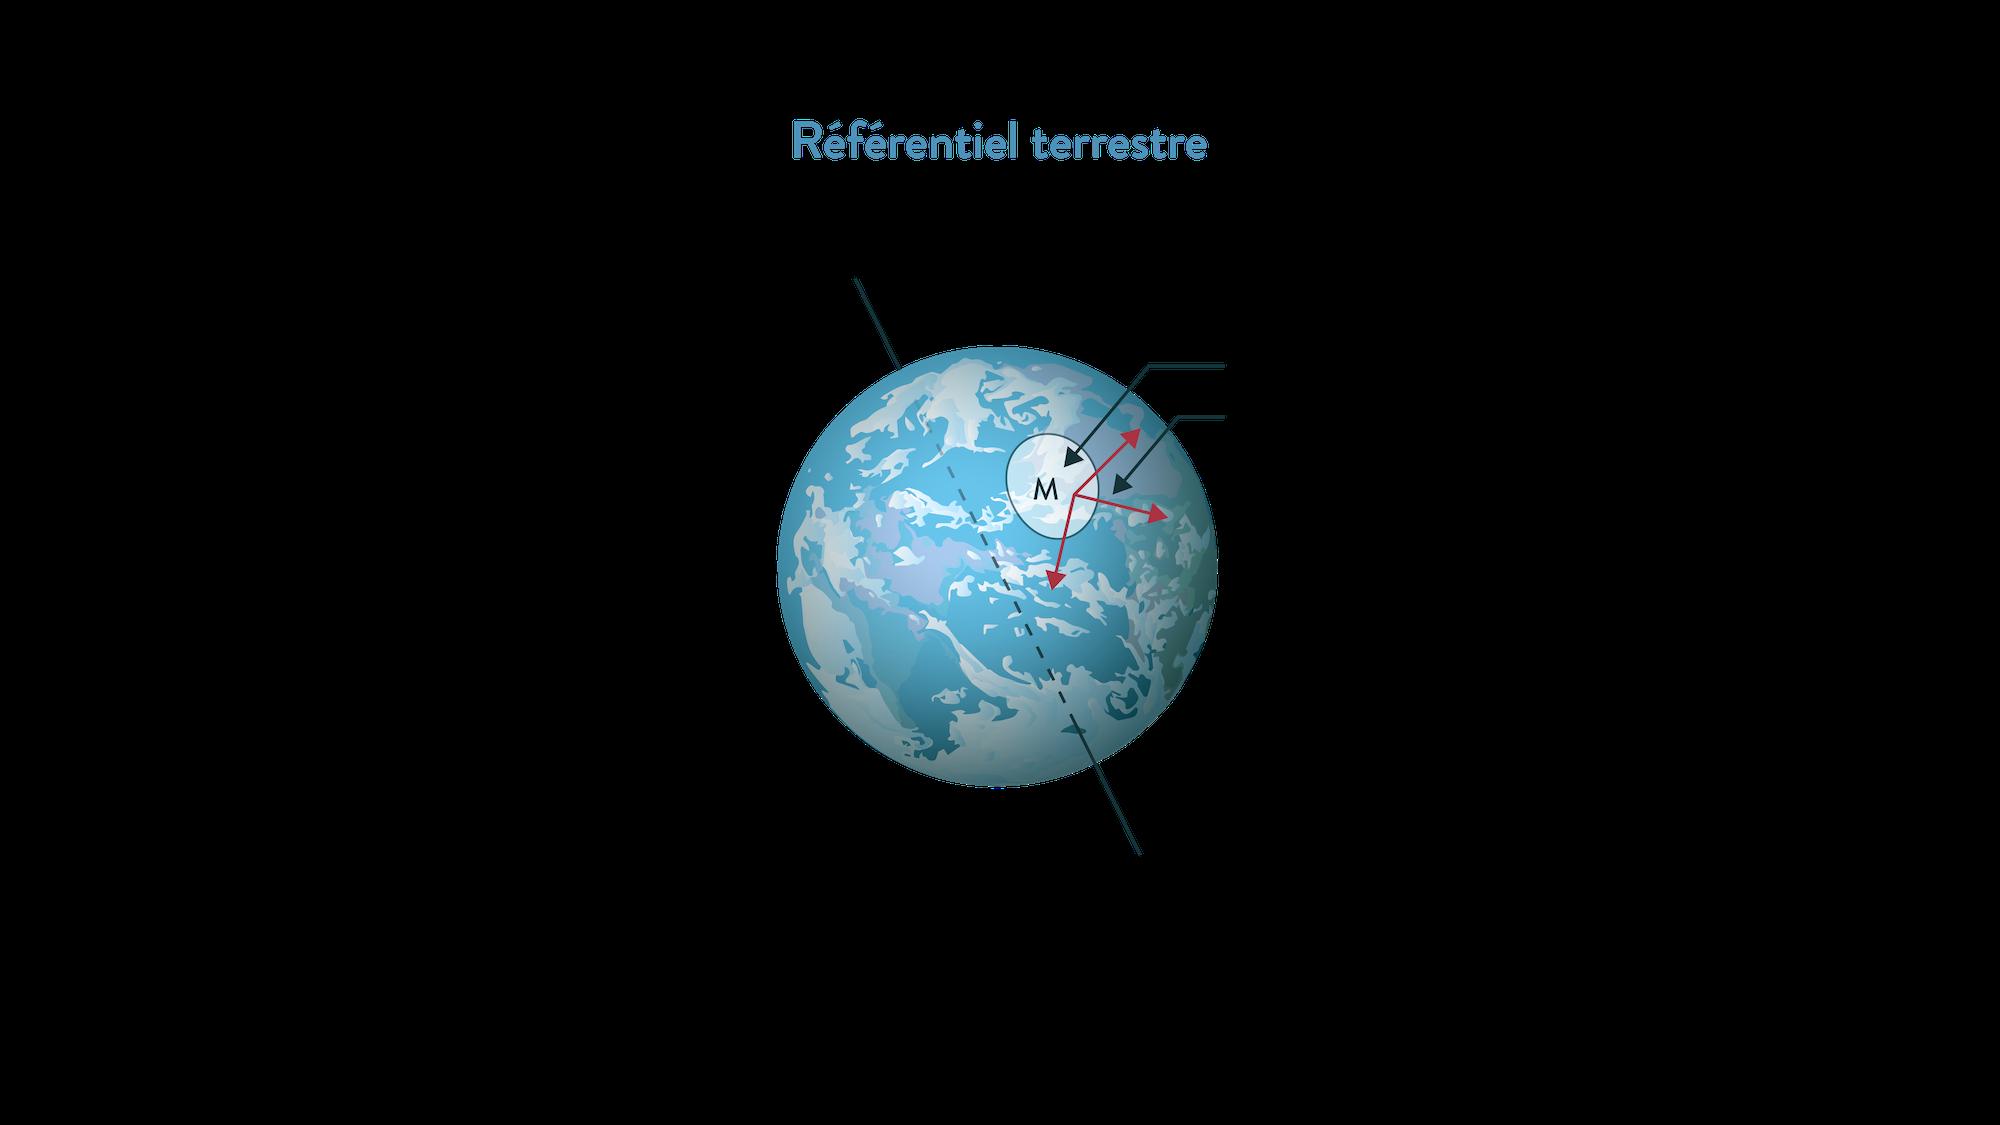 Référentiel terrestre 2nde